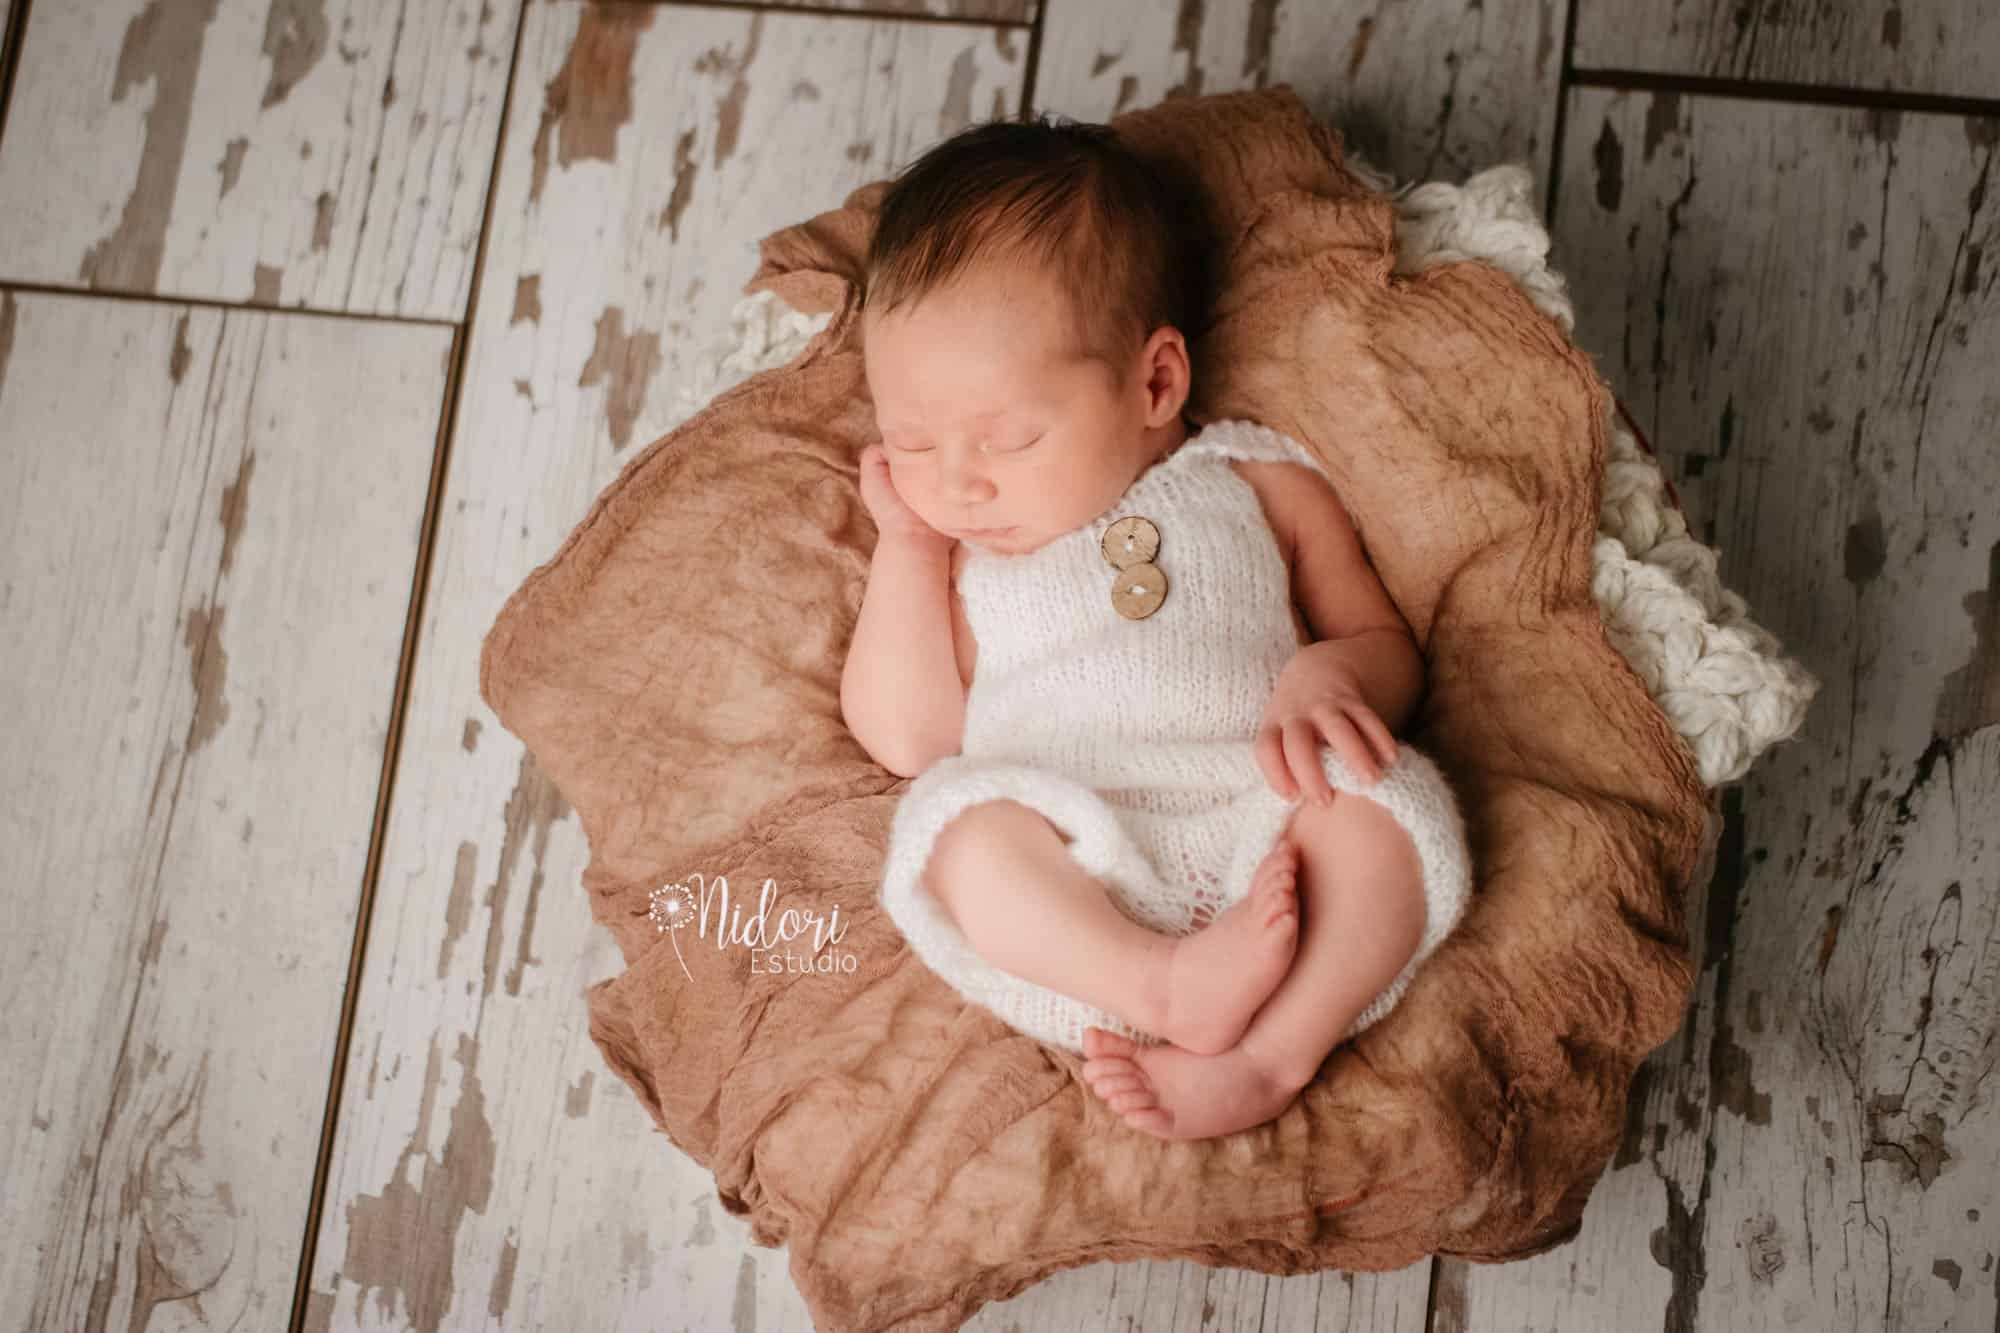 fotosbebe-fotografia-recien-nacido-newborn-bebes-nidoriestudio-fotos-valencia-almazora-castellon-españa-spain-13